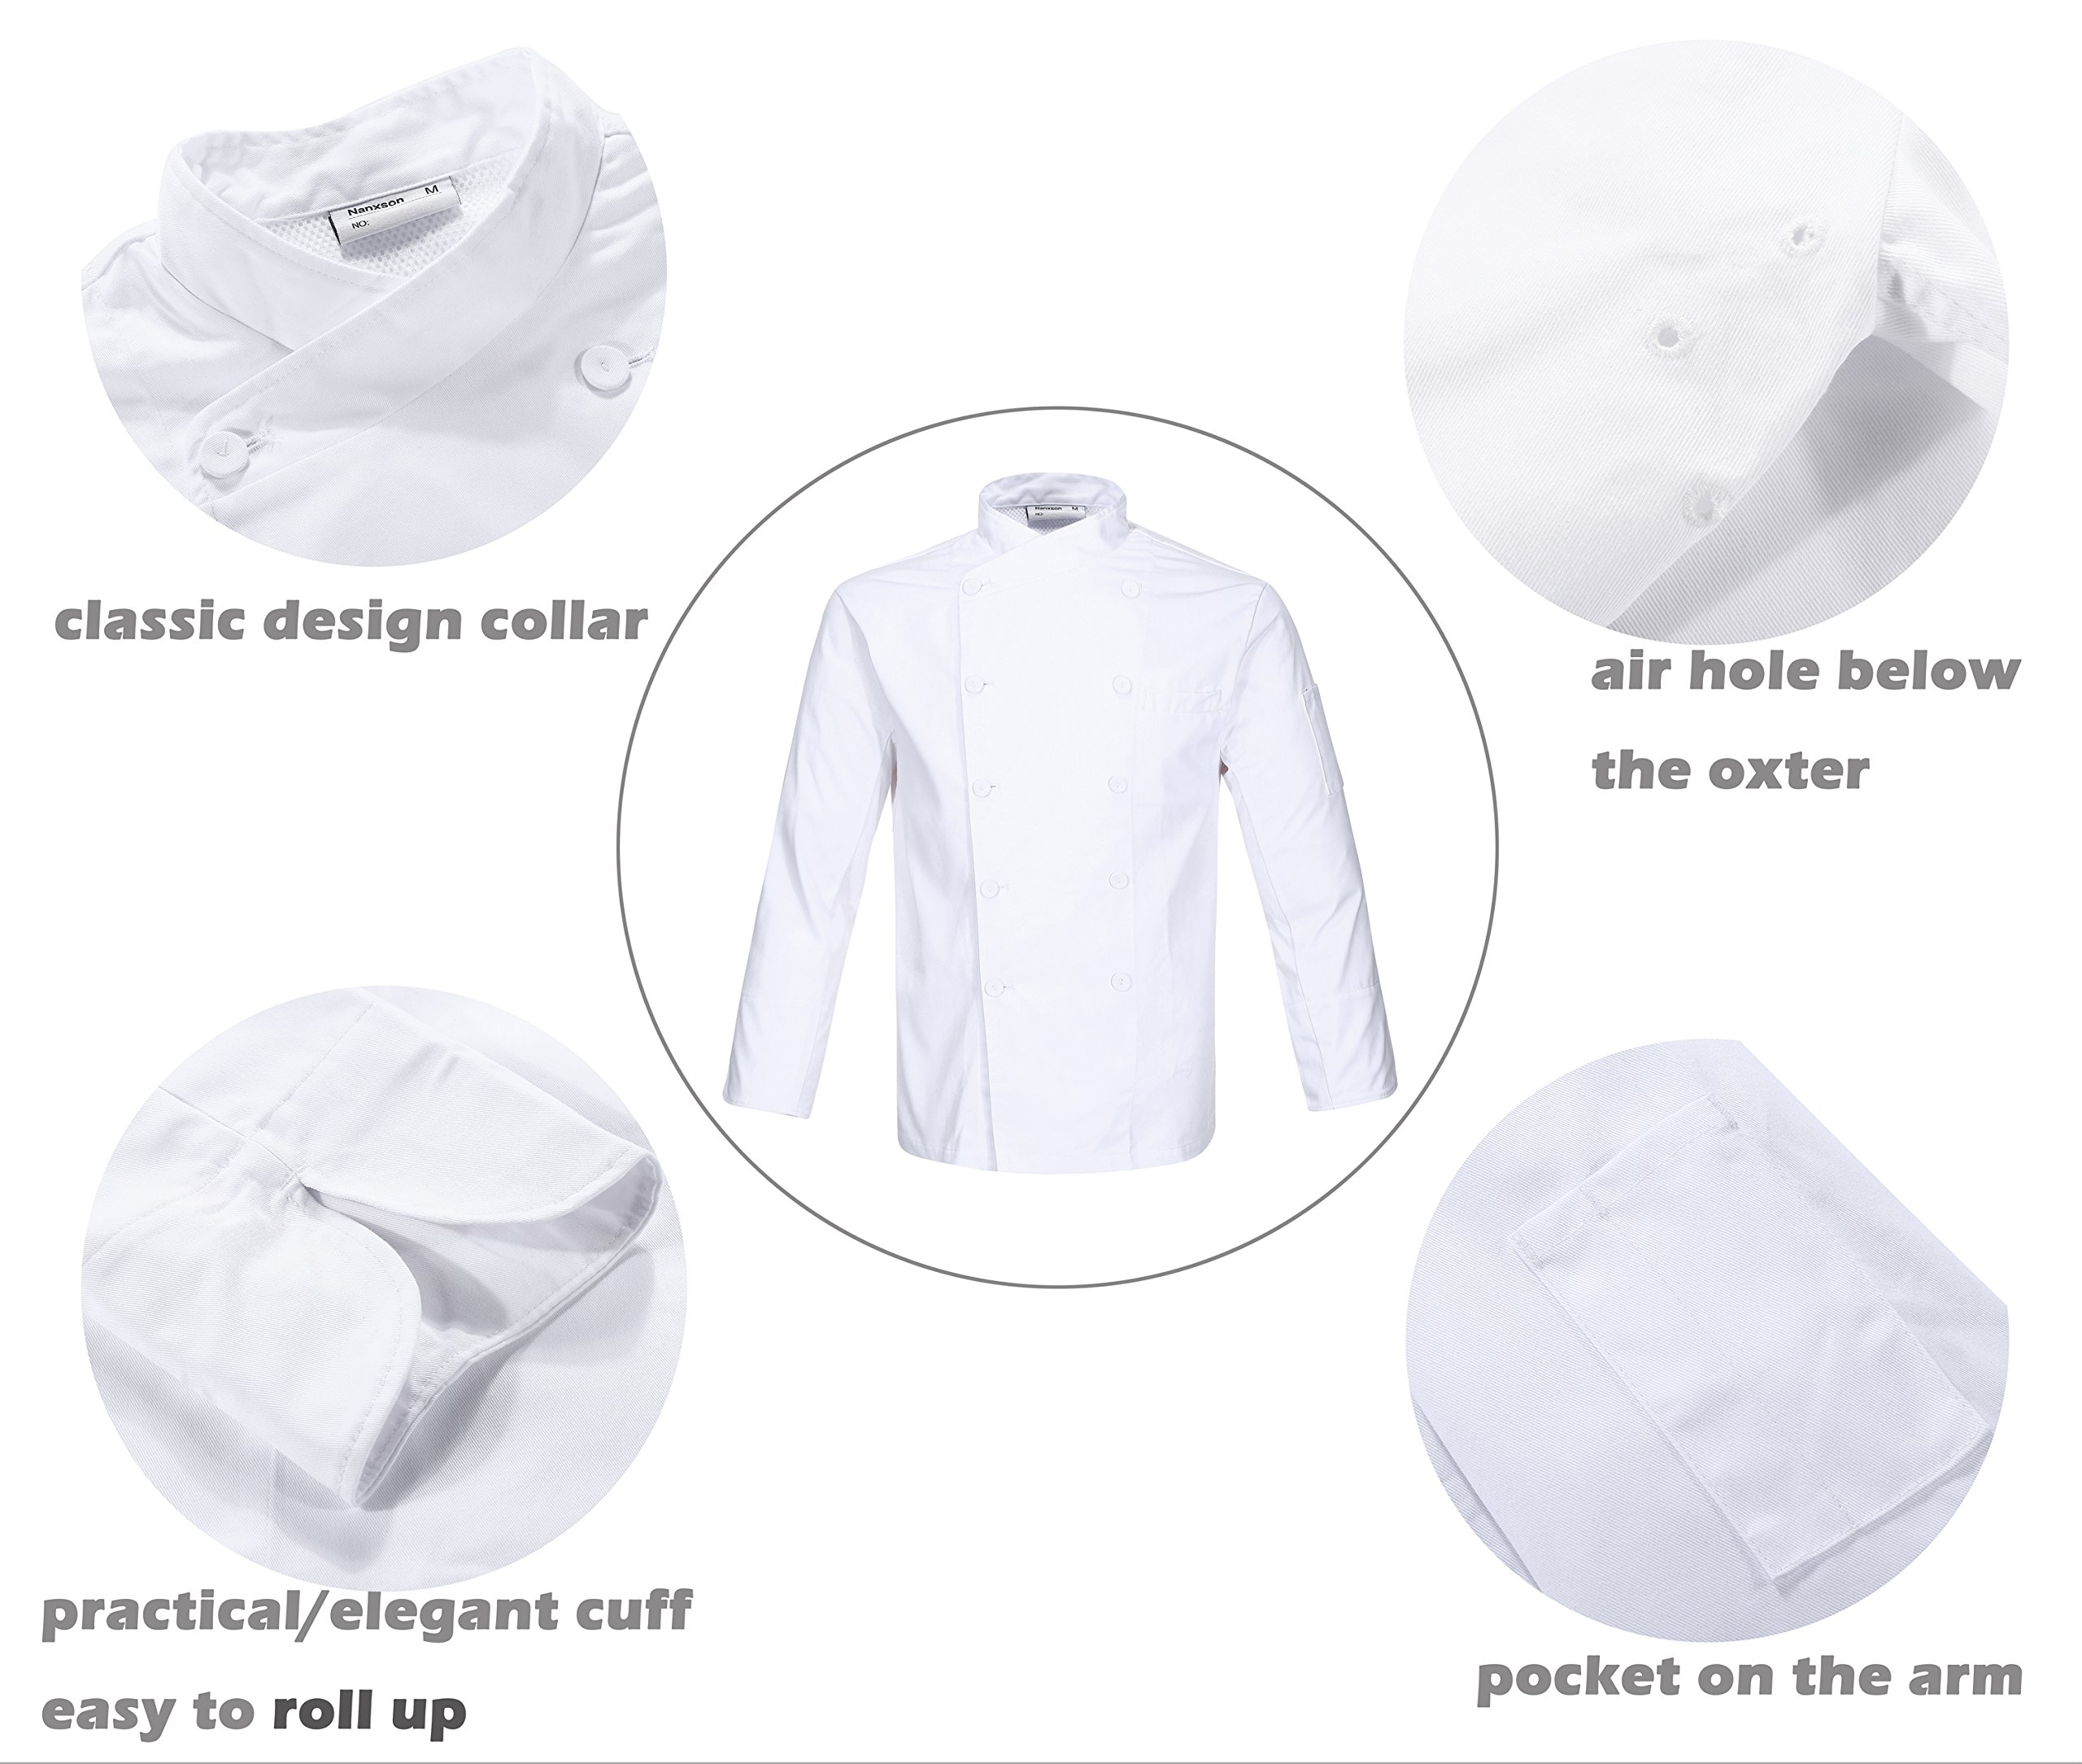 Nanxson(TM Kitchen Cotton Uniform Roll-up Sleeve Chef Working Coat with Air Mesh CFM0028 (White, L) by Nanxson (Image #2)